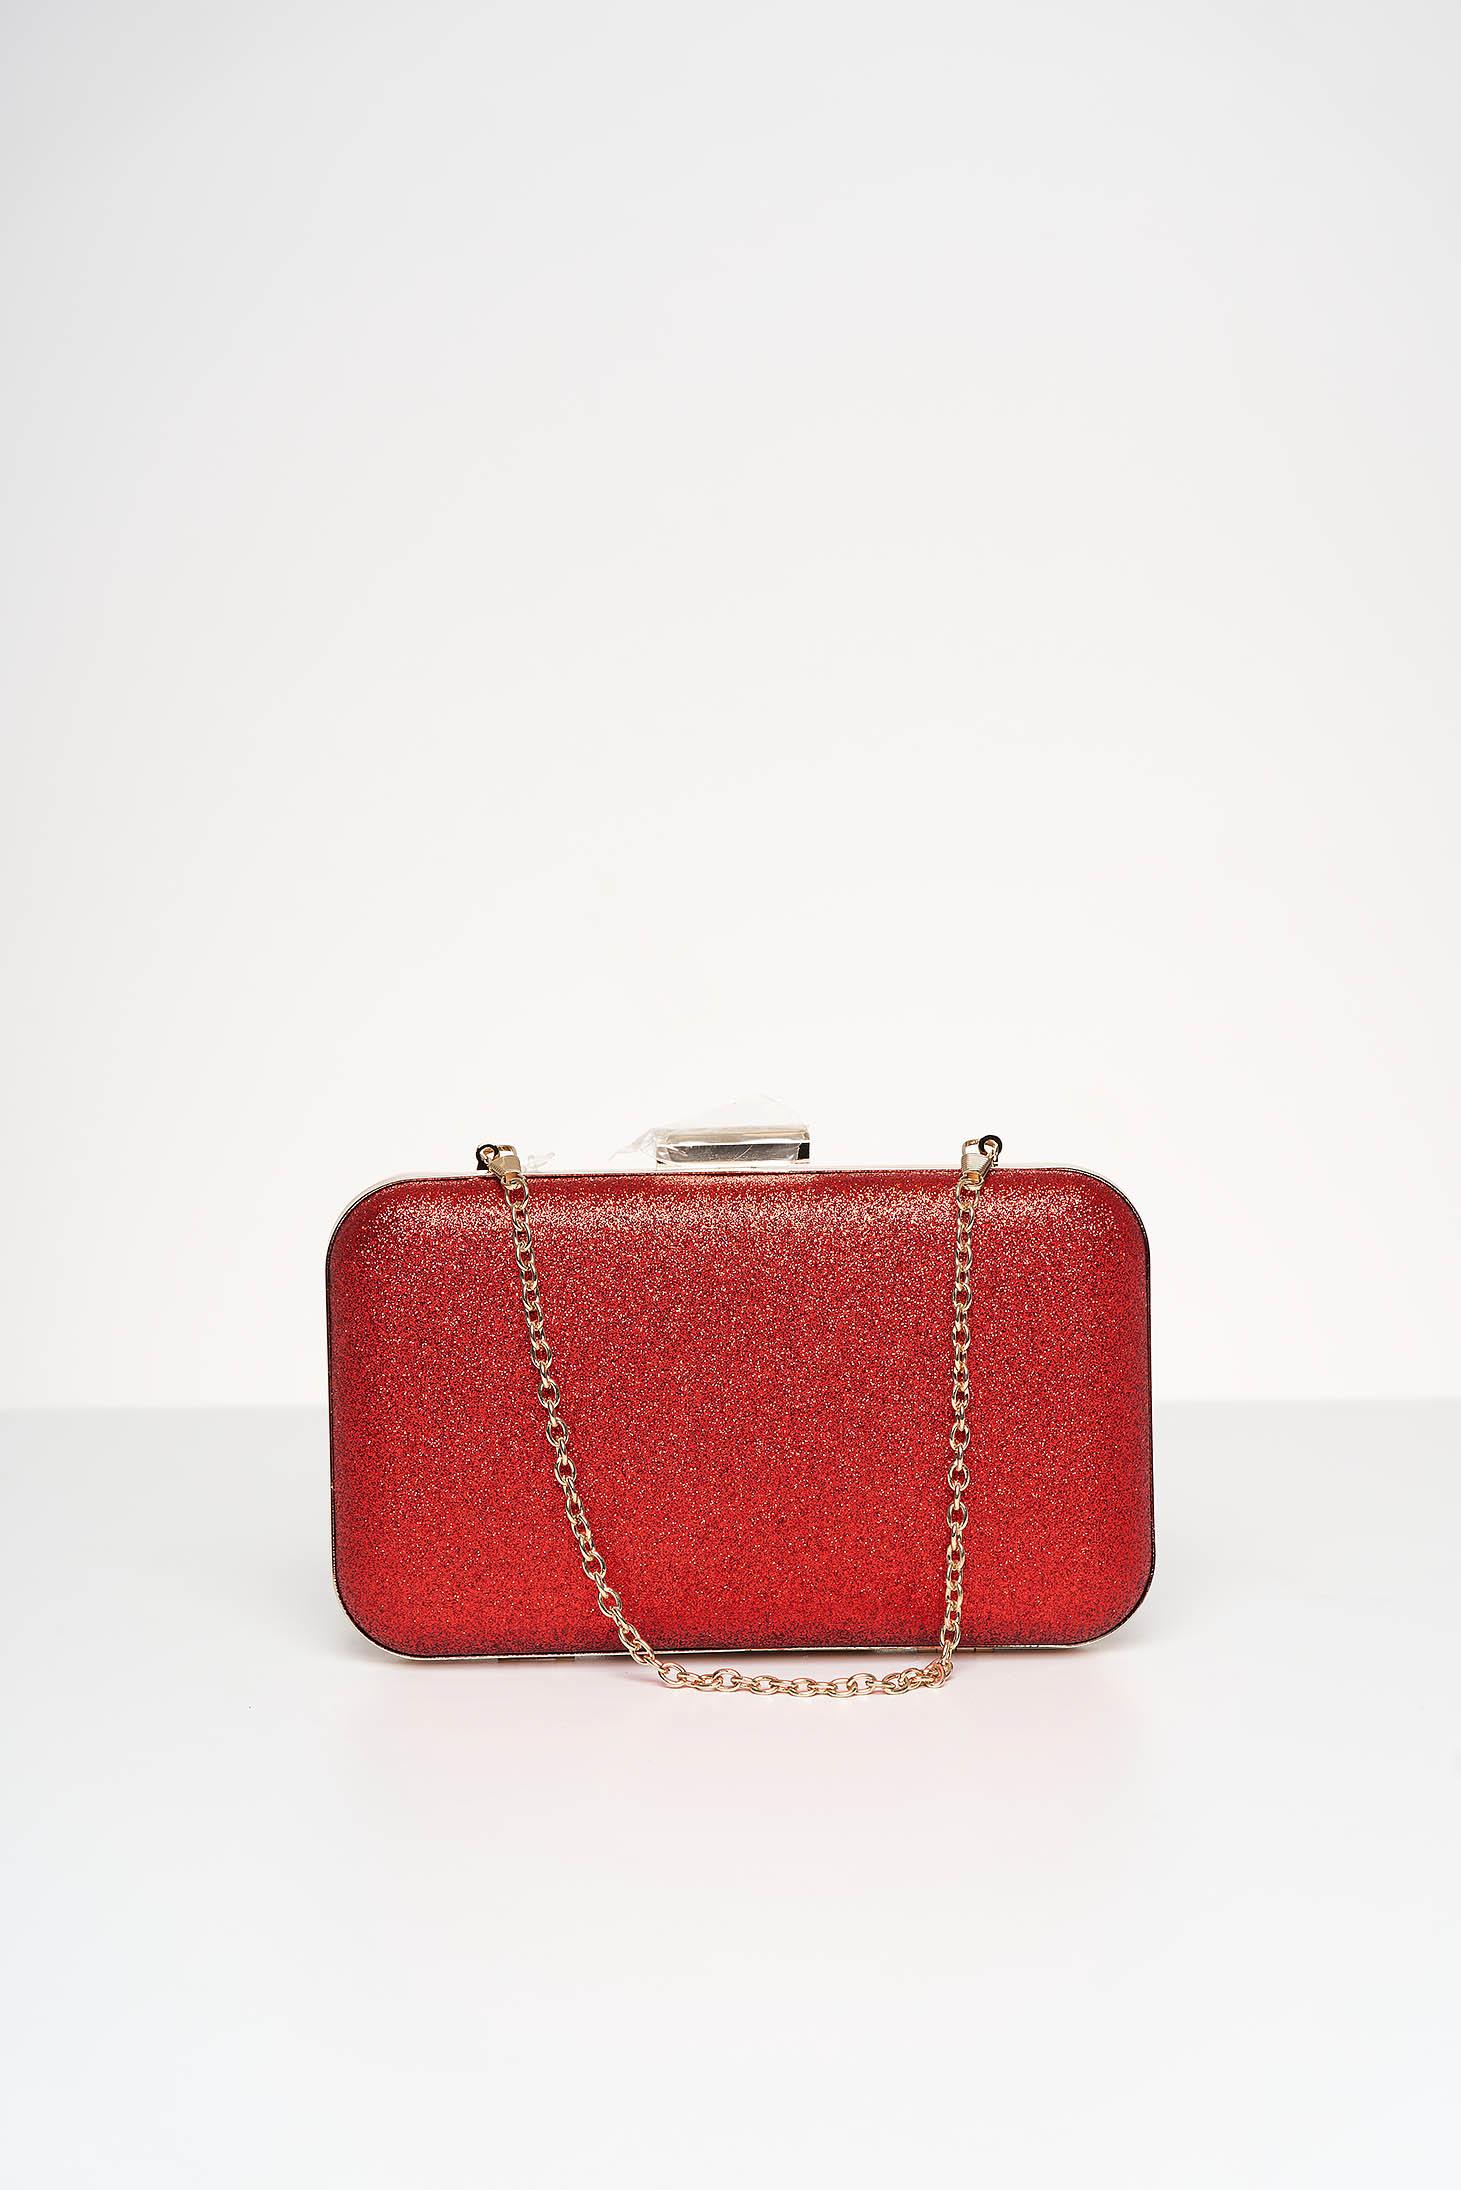 Geanta dama tip clutch rosie de ocazie cu aplicatii cu sclipici